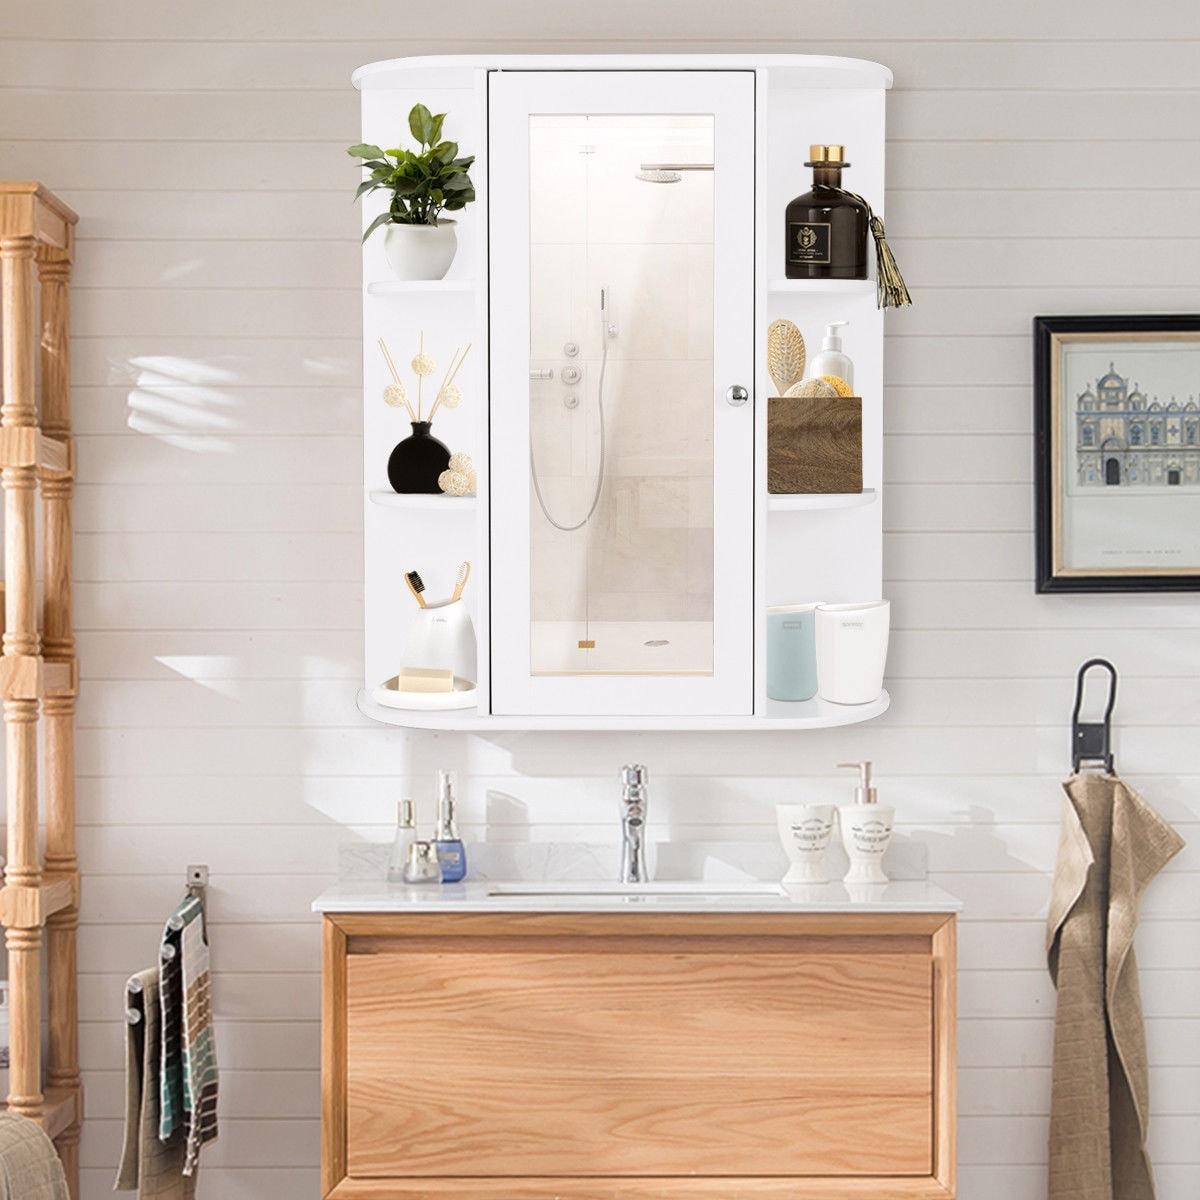 Shop Gymax Bathroom Cabinet Single Door Shelves Wall Mount Cabinet W ...